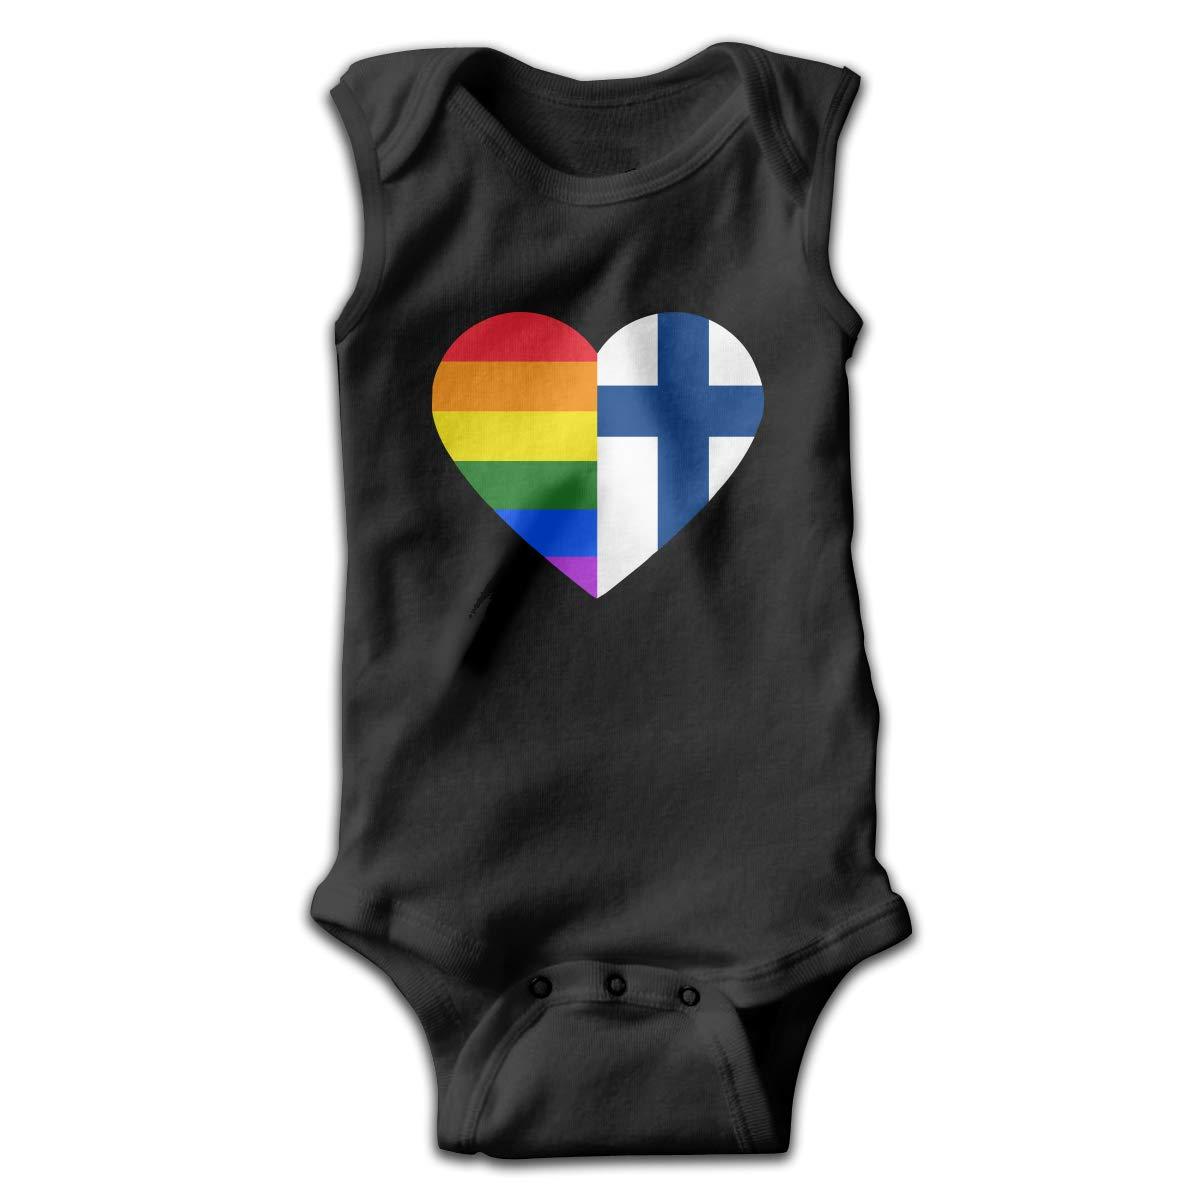 LGBT Rainbow Finland Flag Heart Baby Boys Girls Infant Crawling Suit Sleeveless Romper Bodysuit Rompers